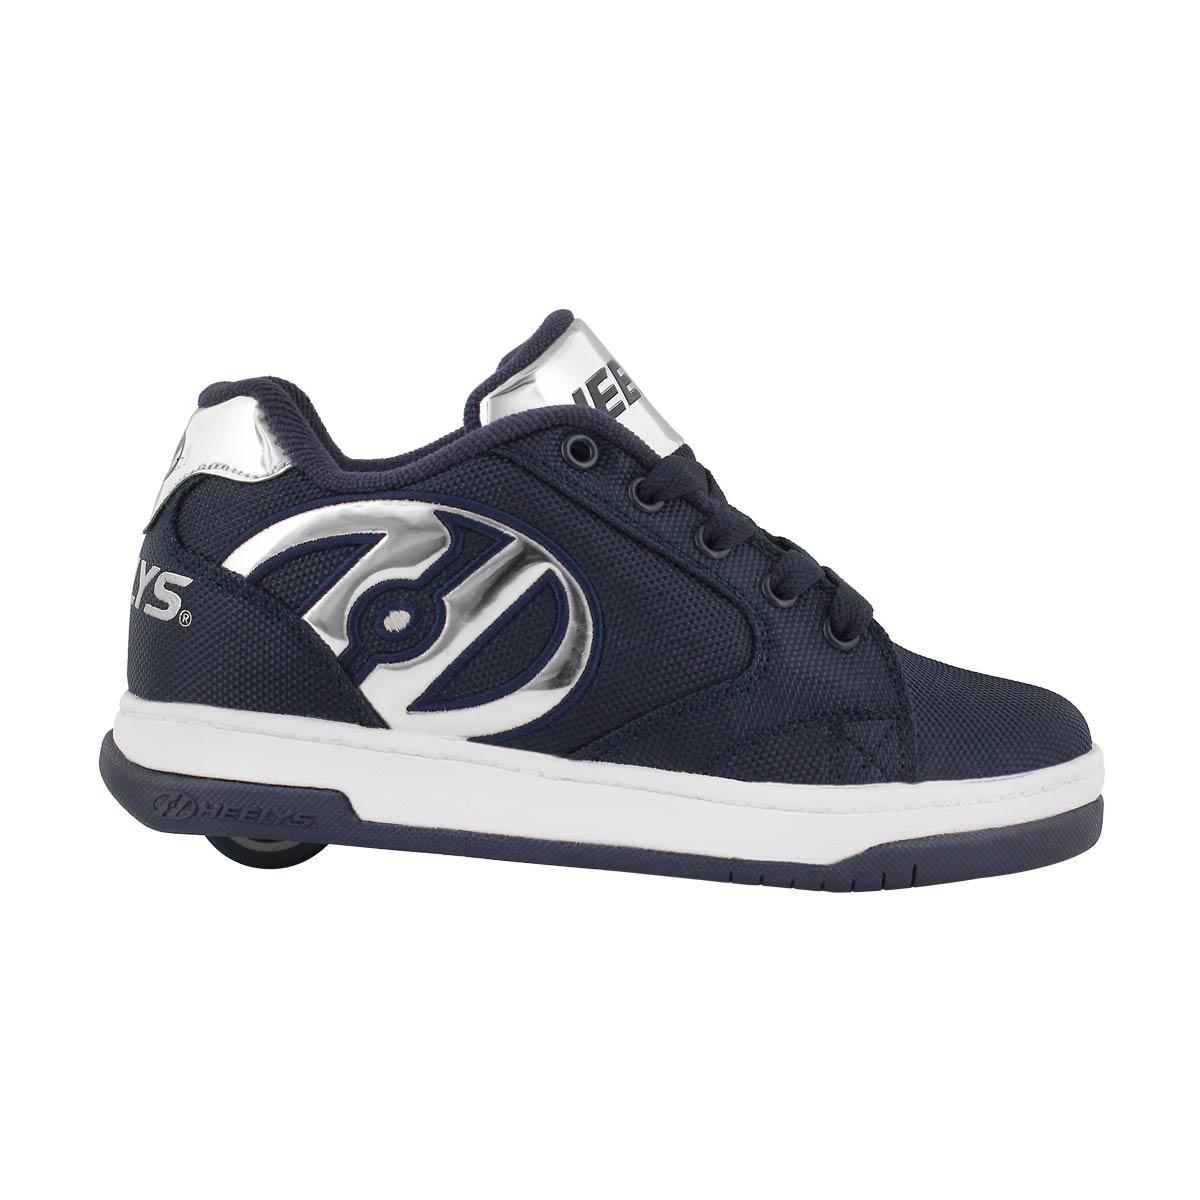 Bys Propel 2.0 navy/slvr skate sneaker